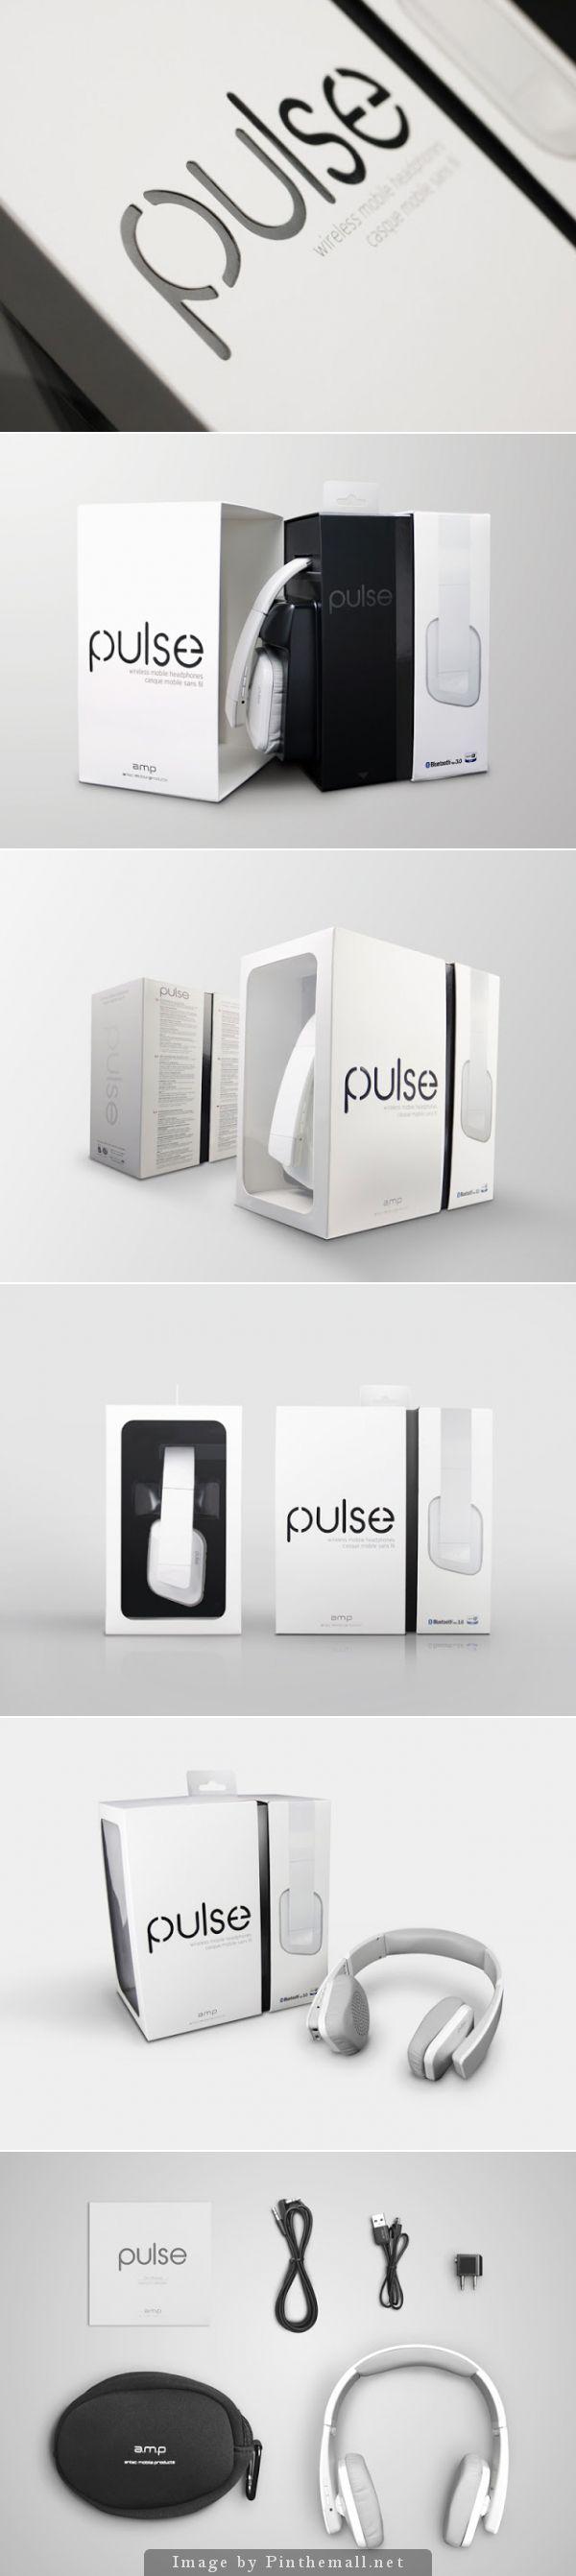 PULSE Headset, Creative Agency: CRE8 DESIGN, http://www.packagingoftheworld.com/2014/10/pulse-headset.html